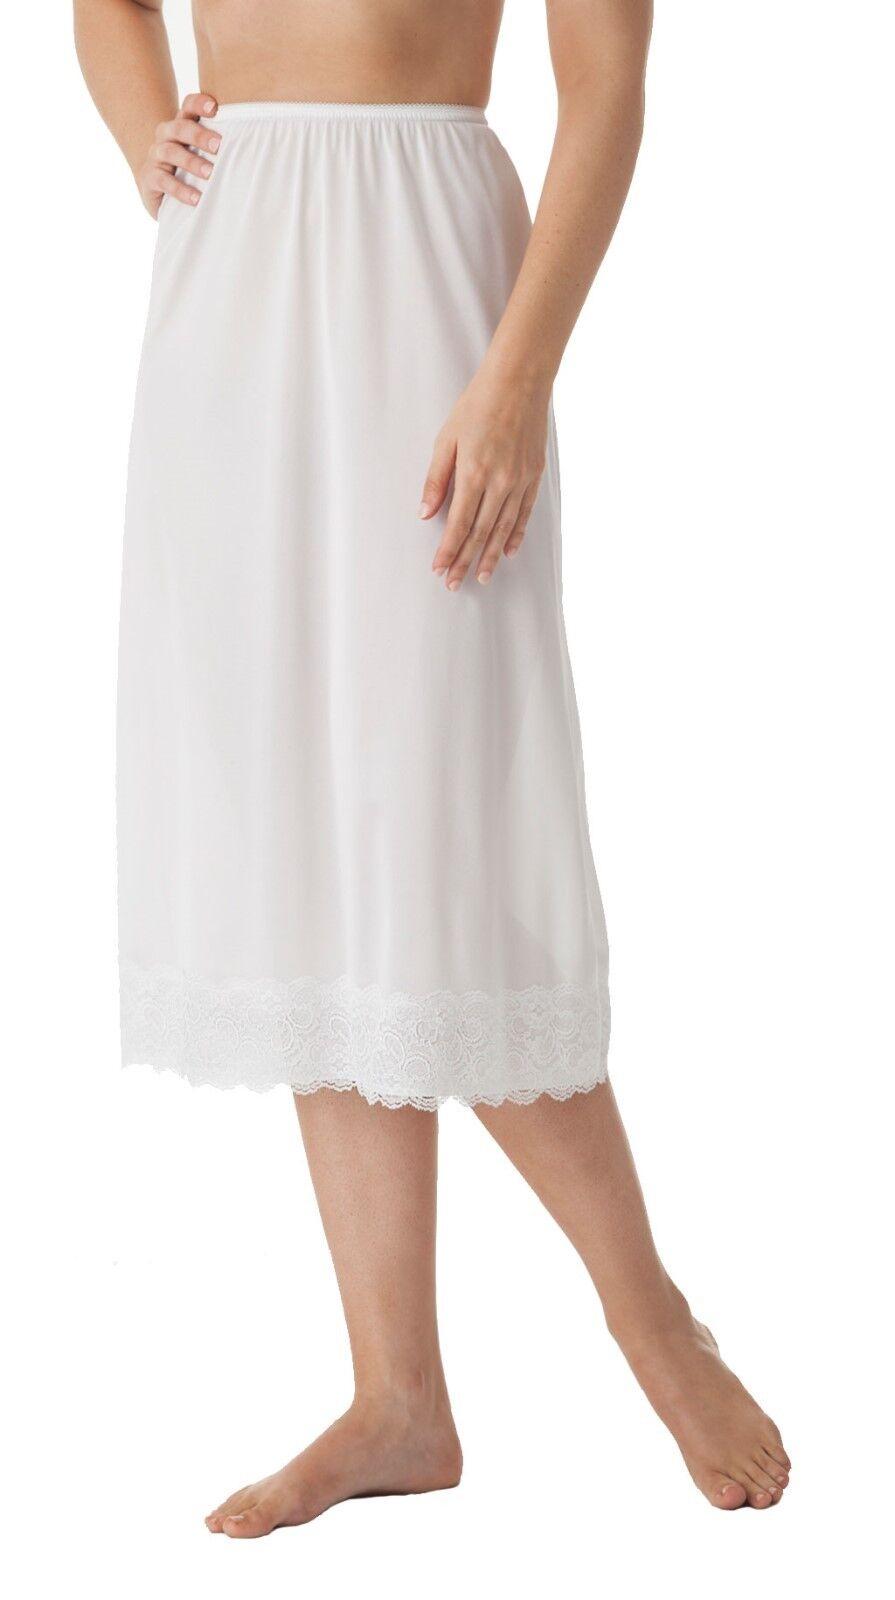 velrose lingerie 31 inch plus size half slips style 2360 1x 5x wide lace hem